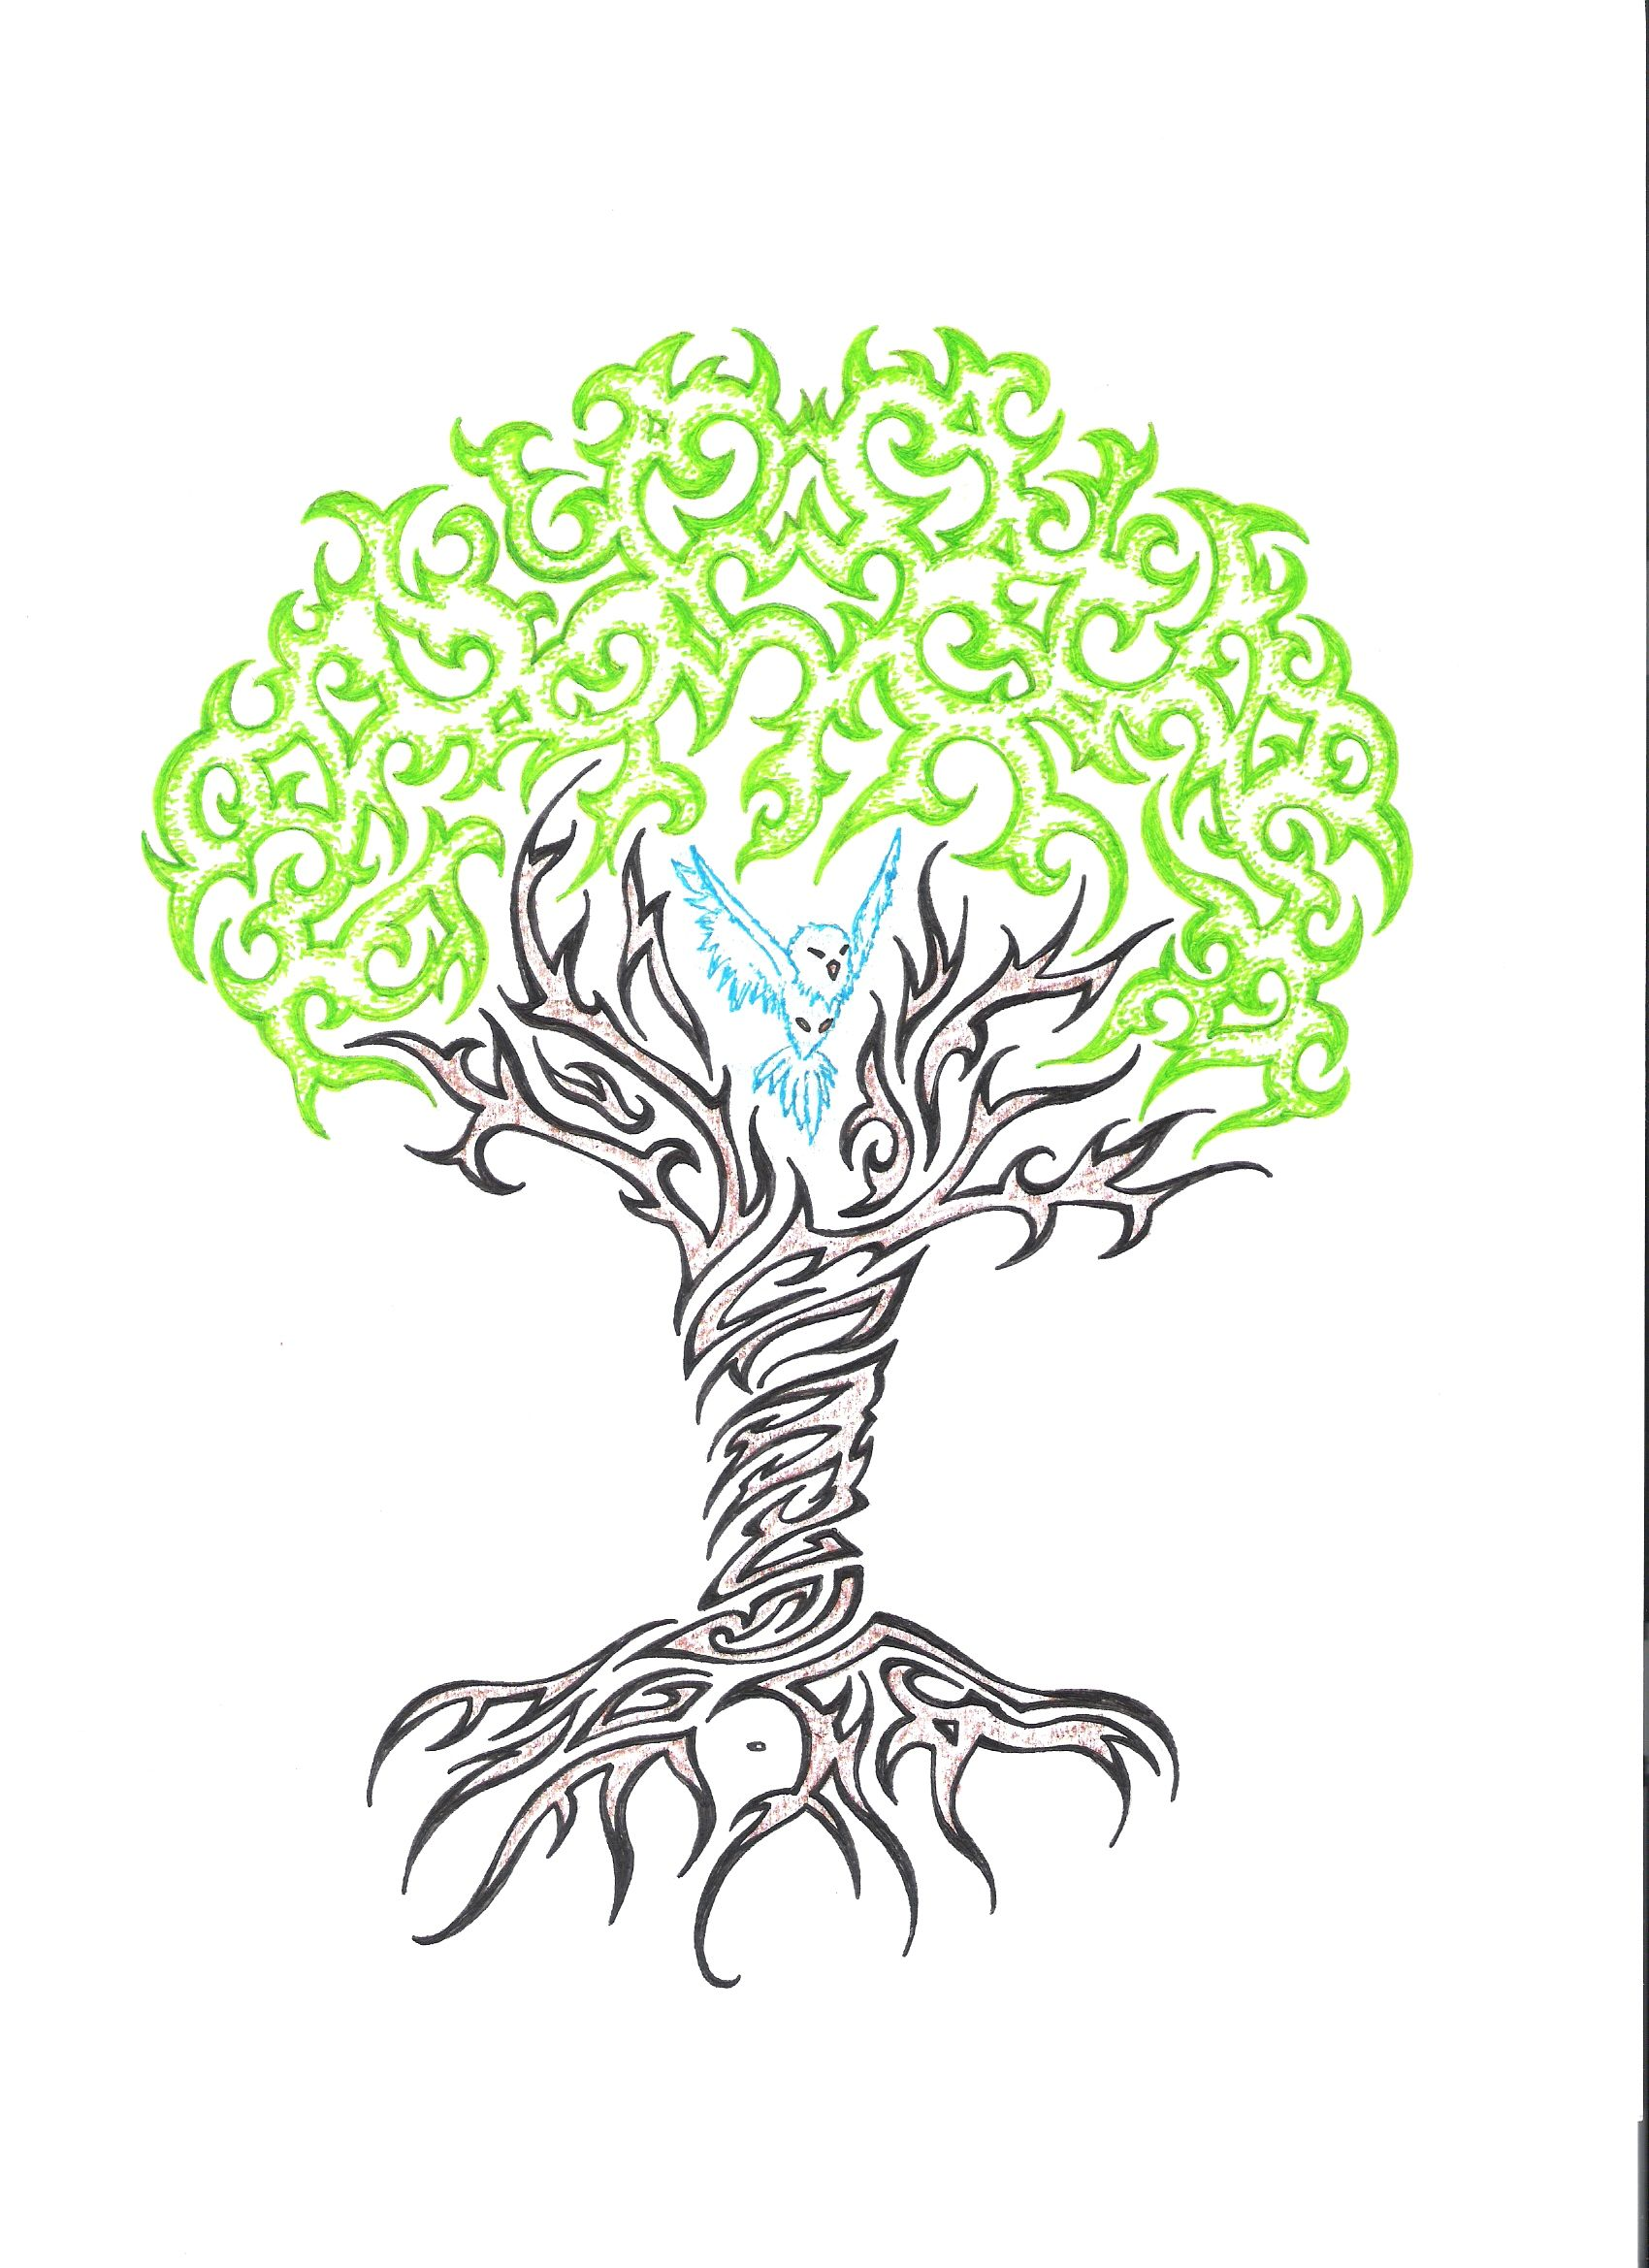 Mustard Seed to Tree | Good Shepherd | Pinterest | Mustard seed ...